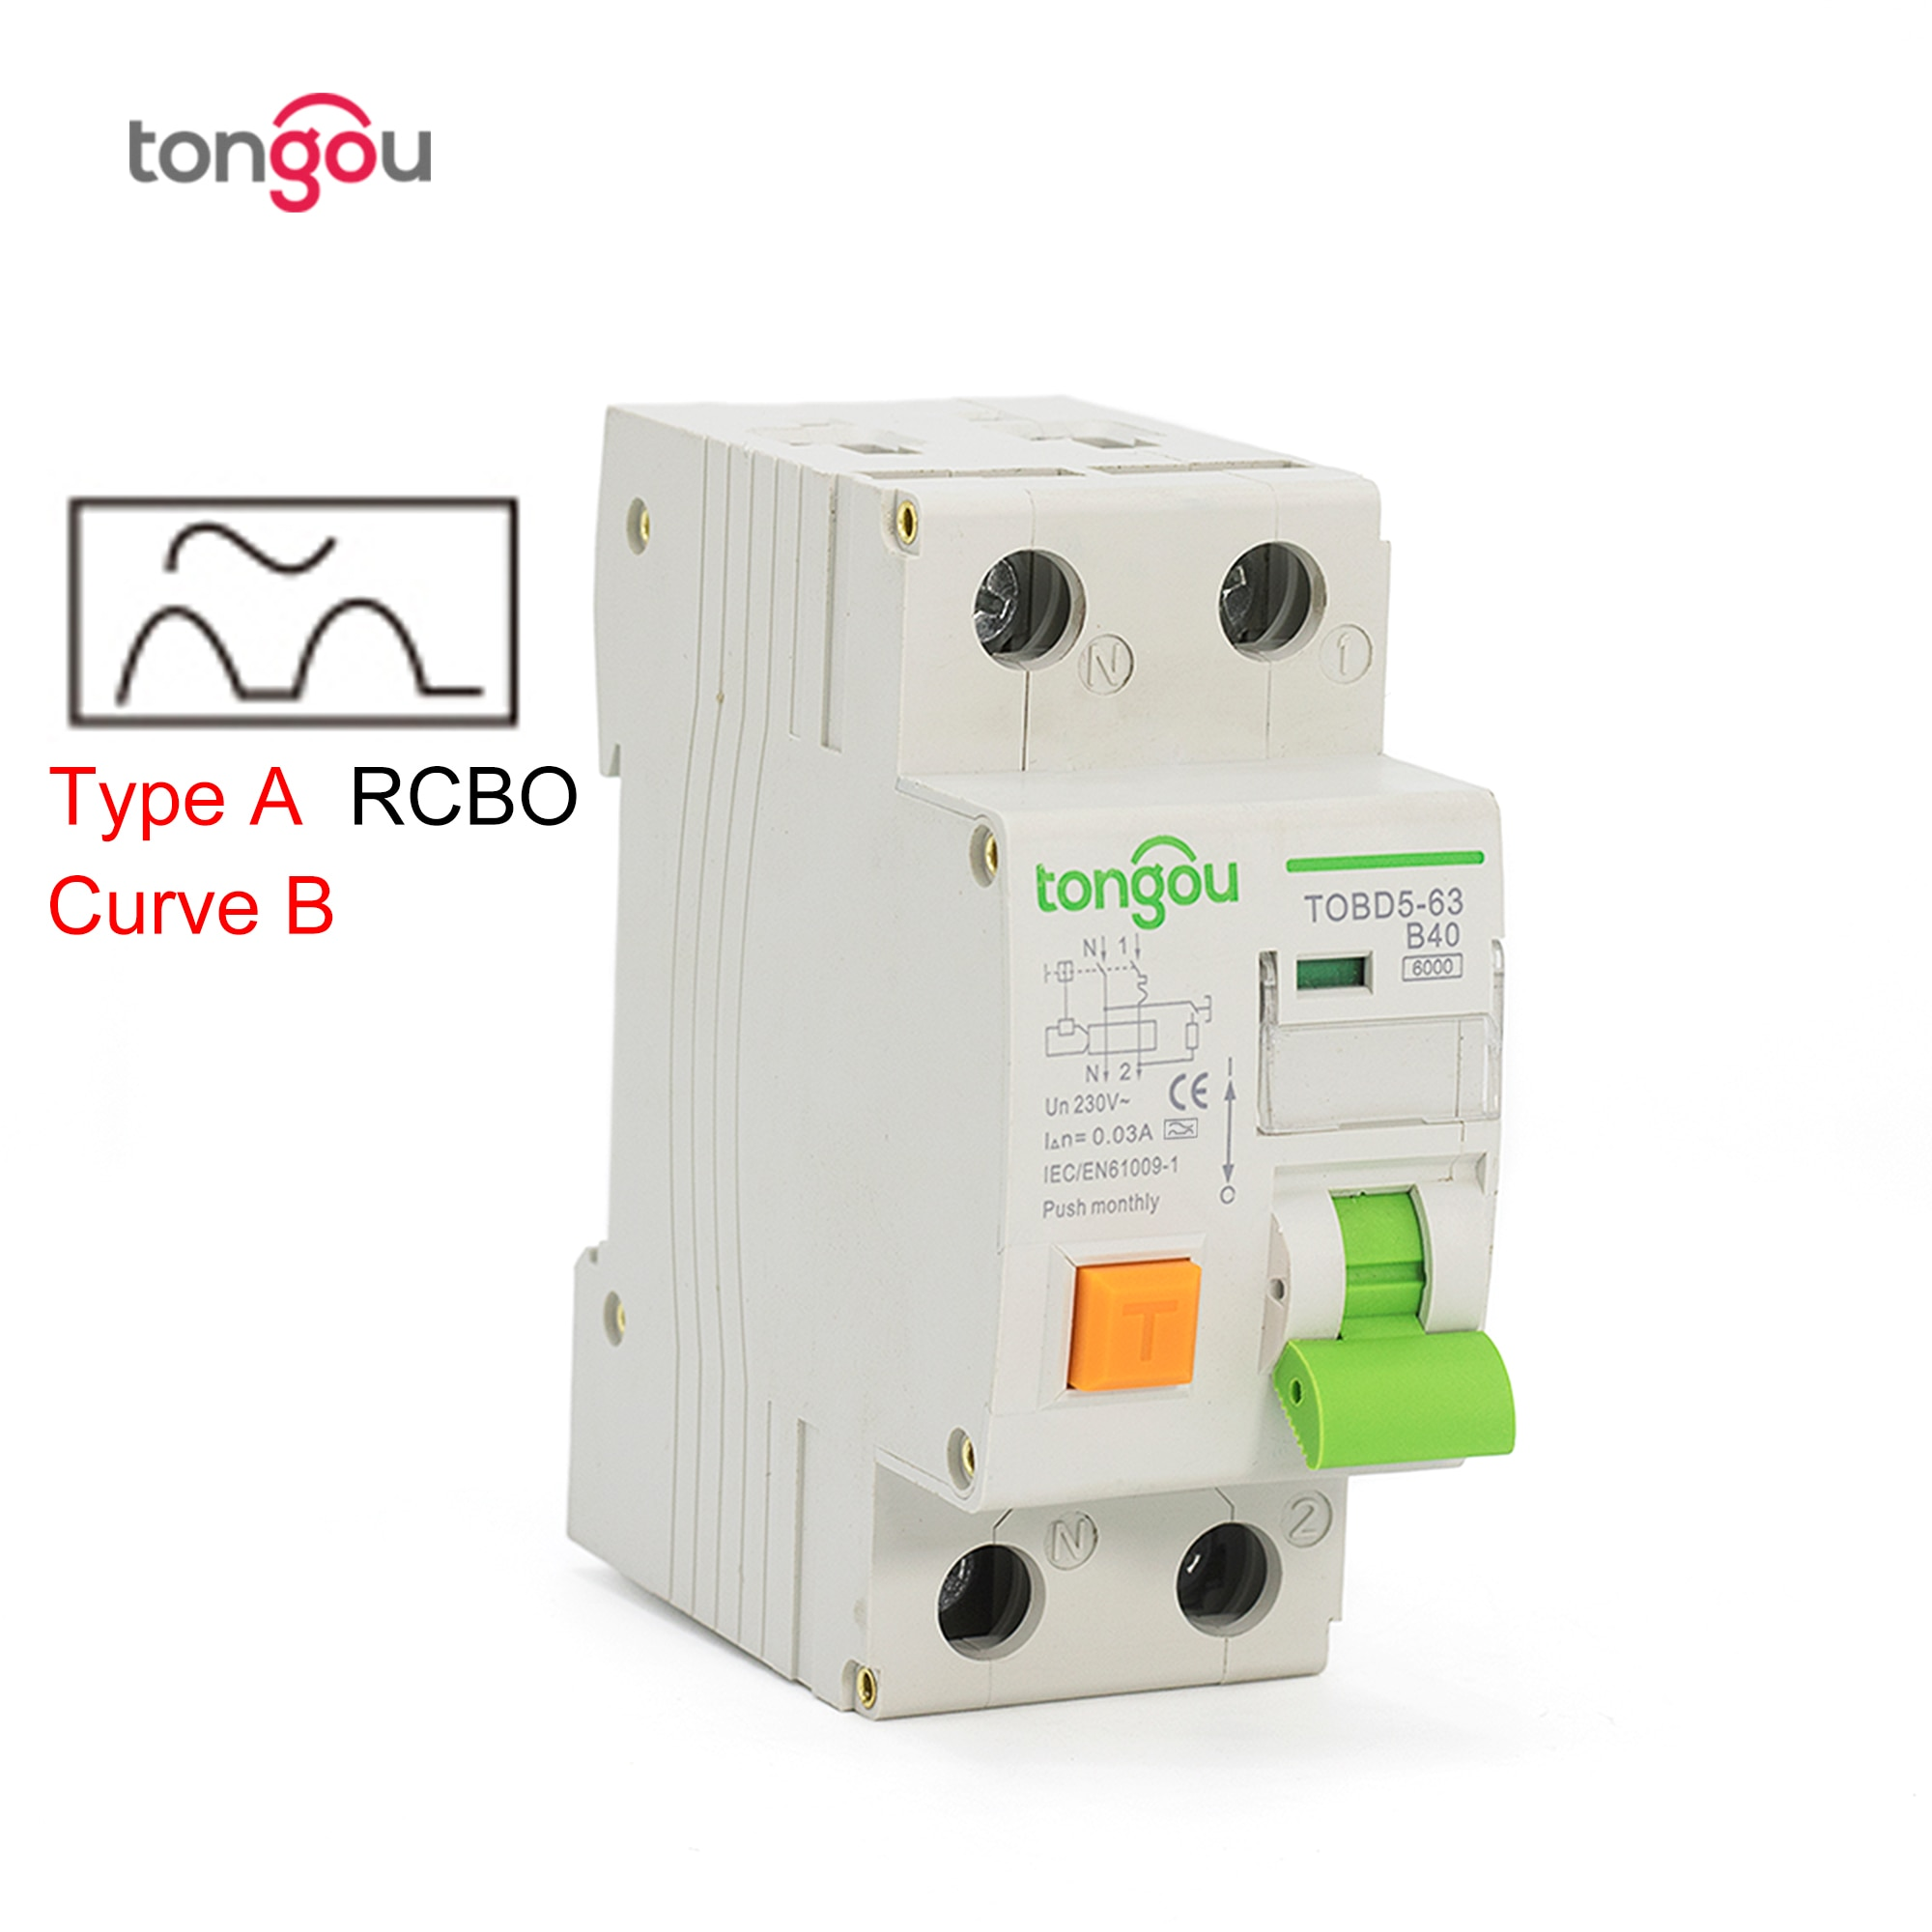 Disyuntor de corriente Residual electromagnético tipo A curva B RCBO 6KA 1P + N 16A 40A con protección contra sobrecorriente y fugas